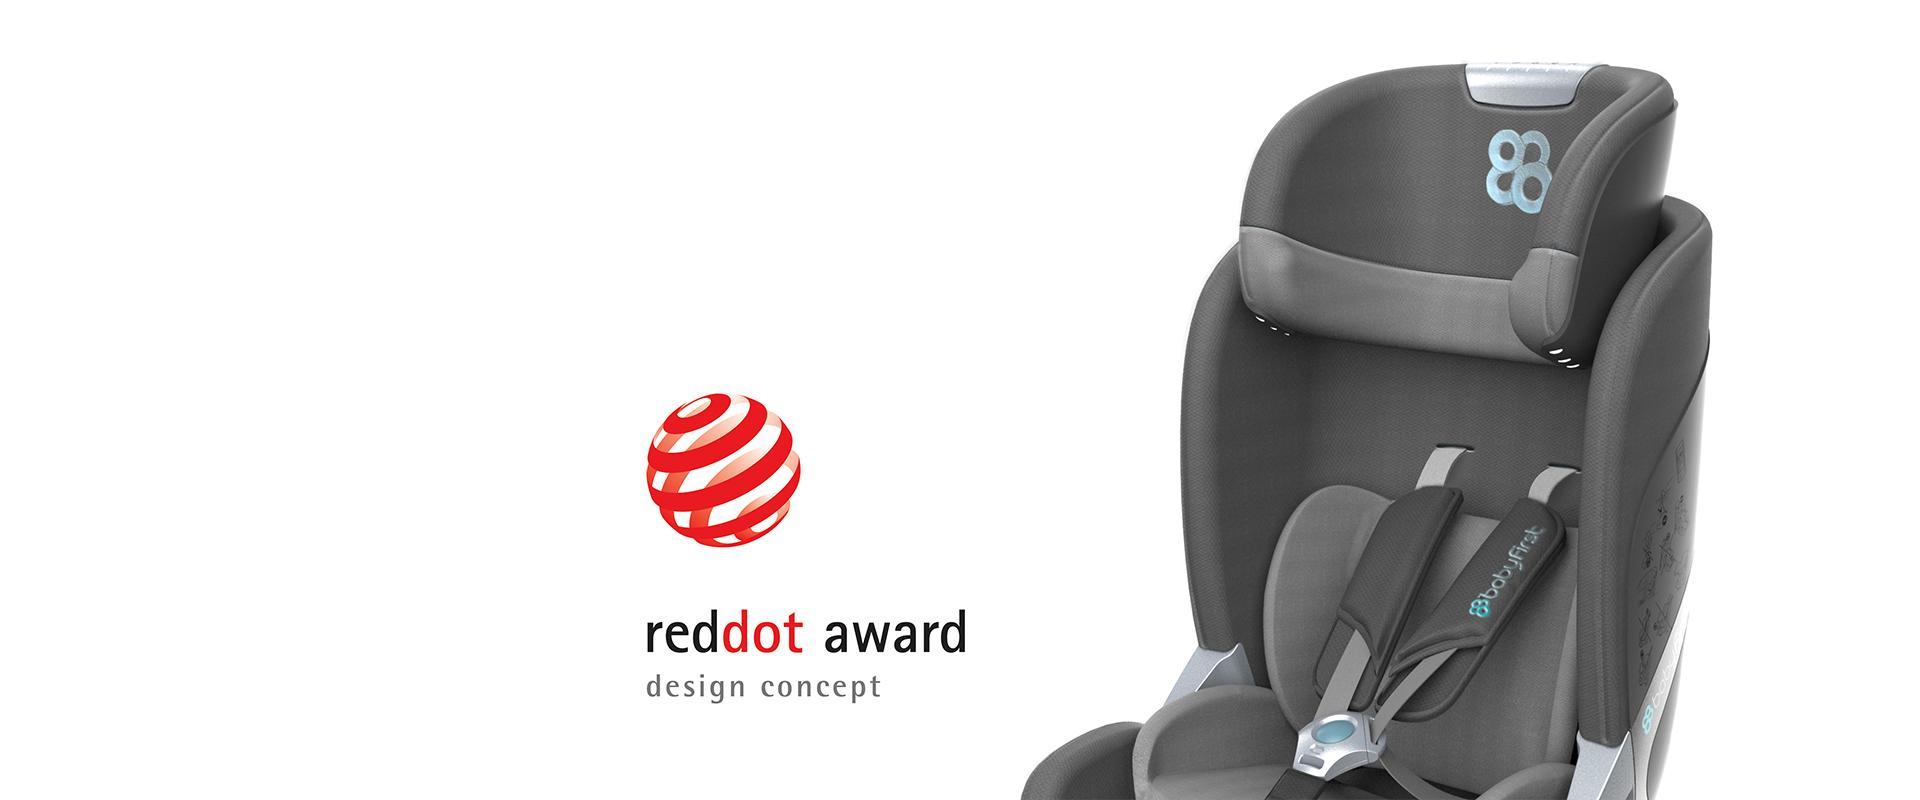 Smart Design Baby First R542 Won A Red Dot Design Concept Award